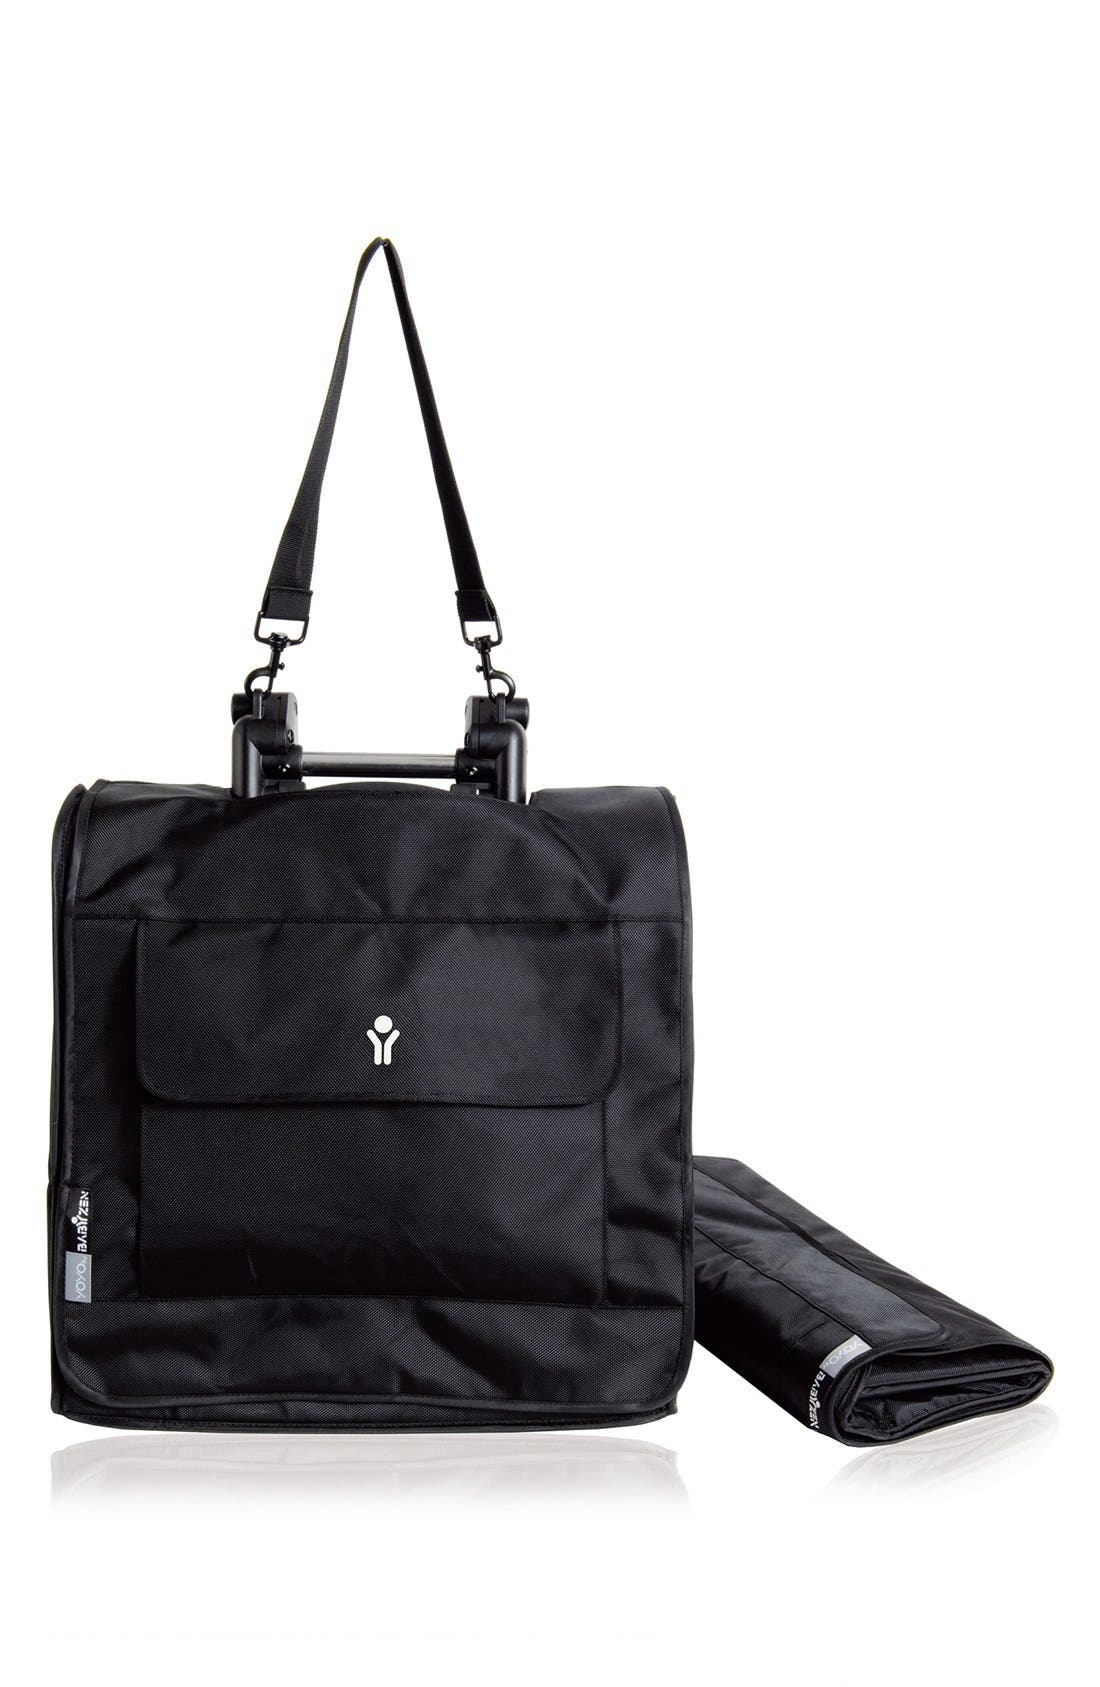 'YOYO' Stroller Travel Bag,                             Main thumbnail 1, color,                             Black